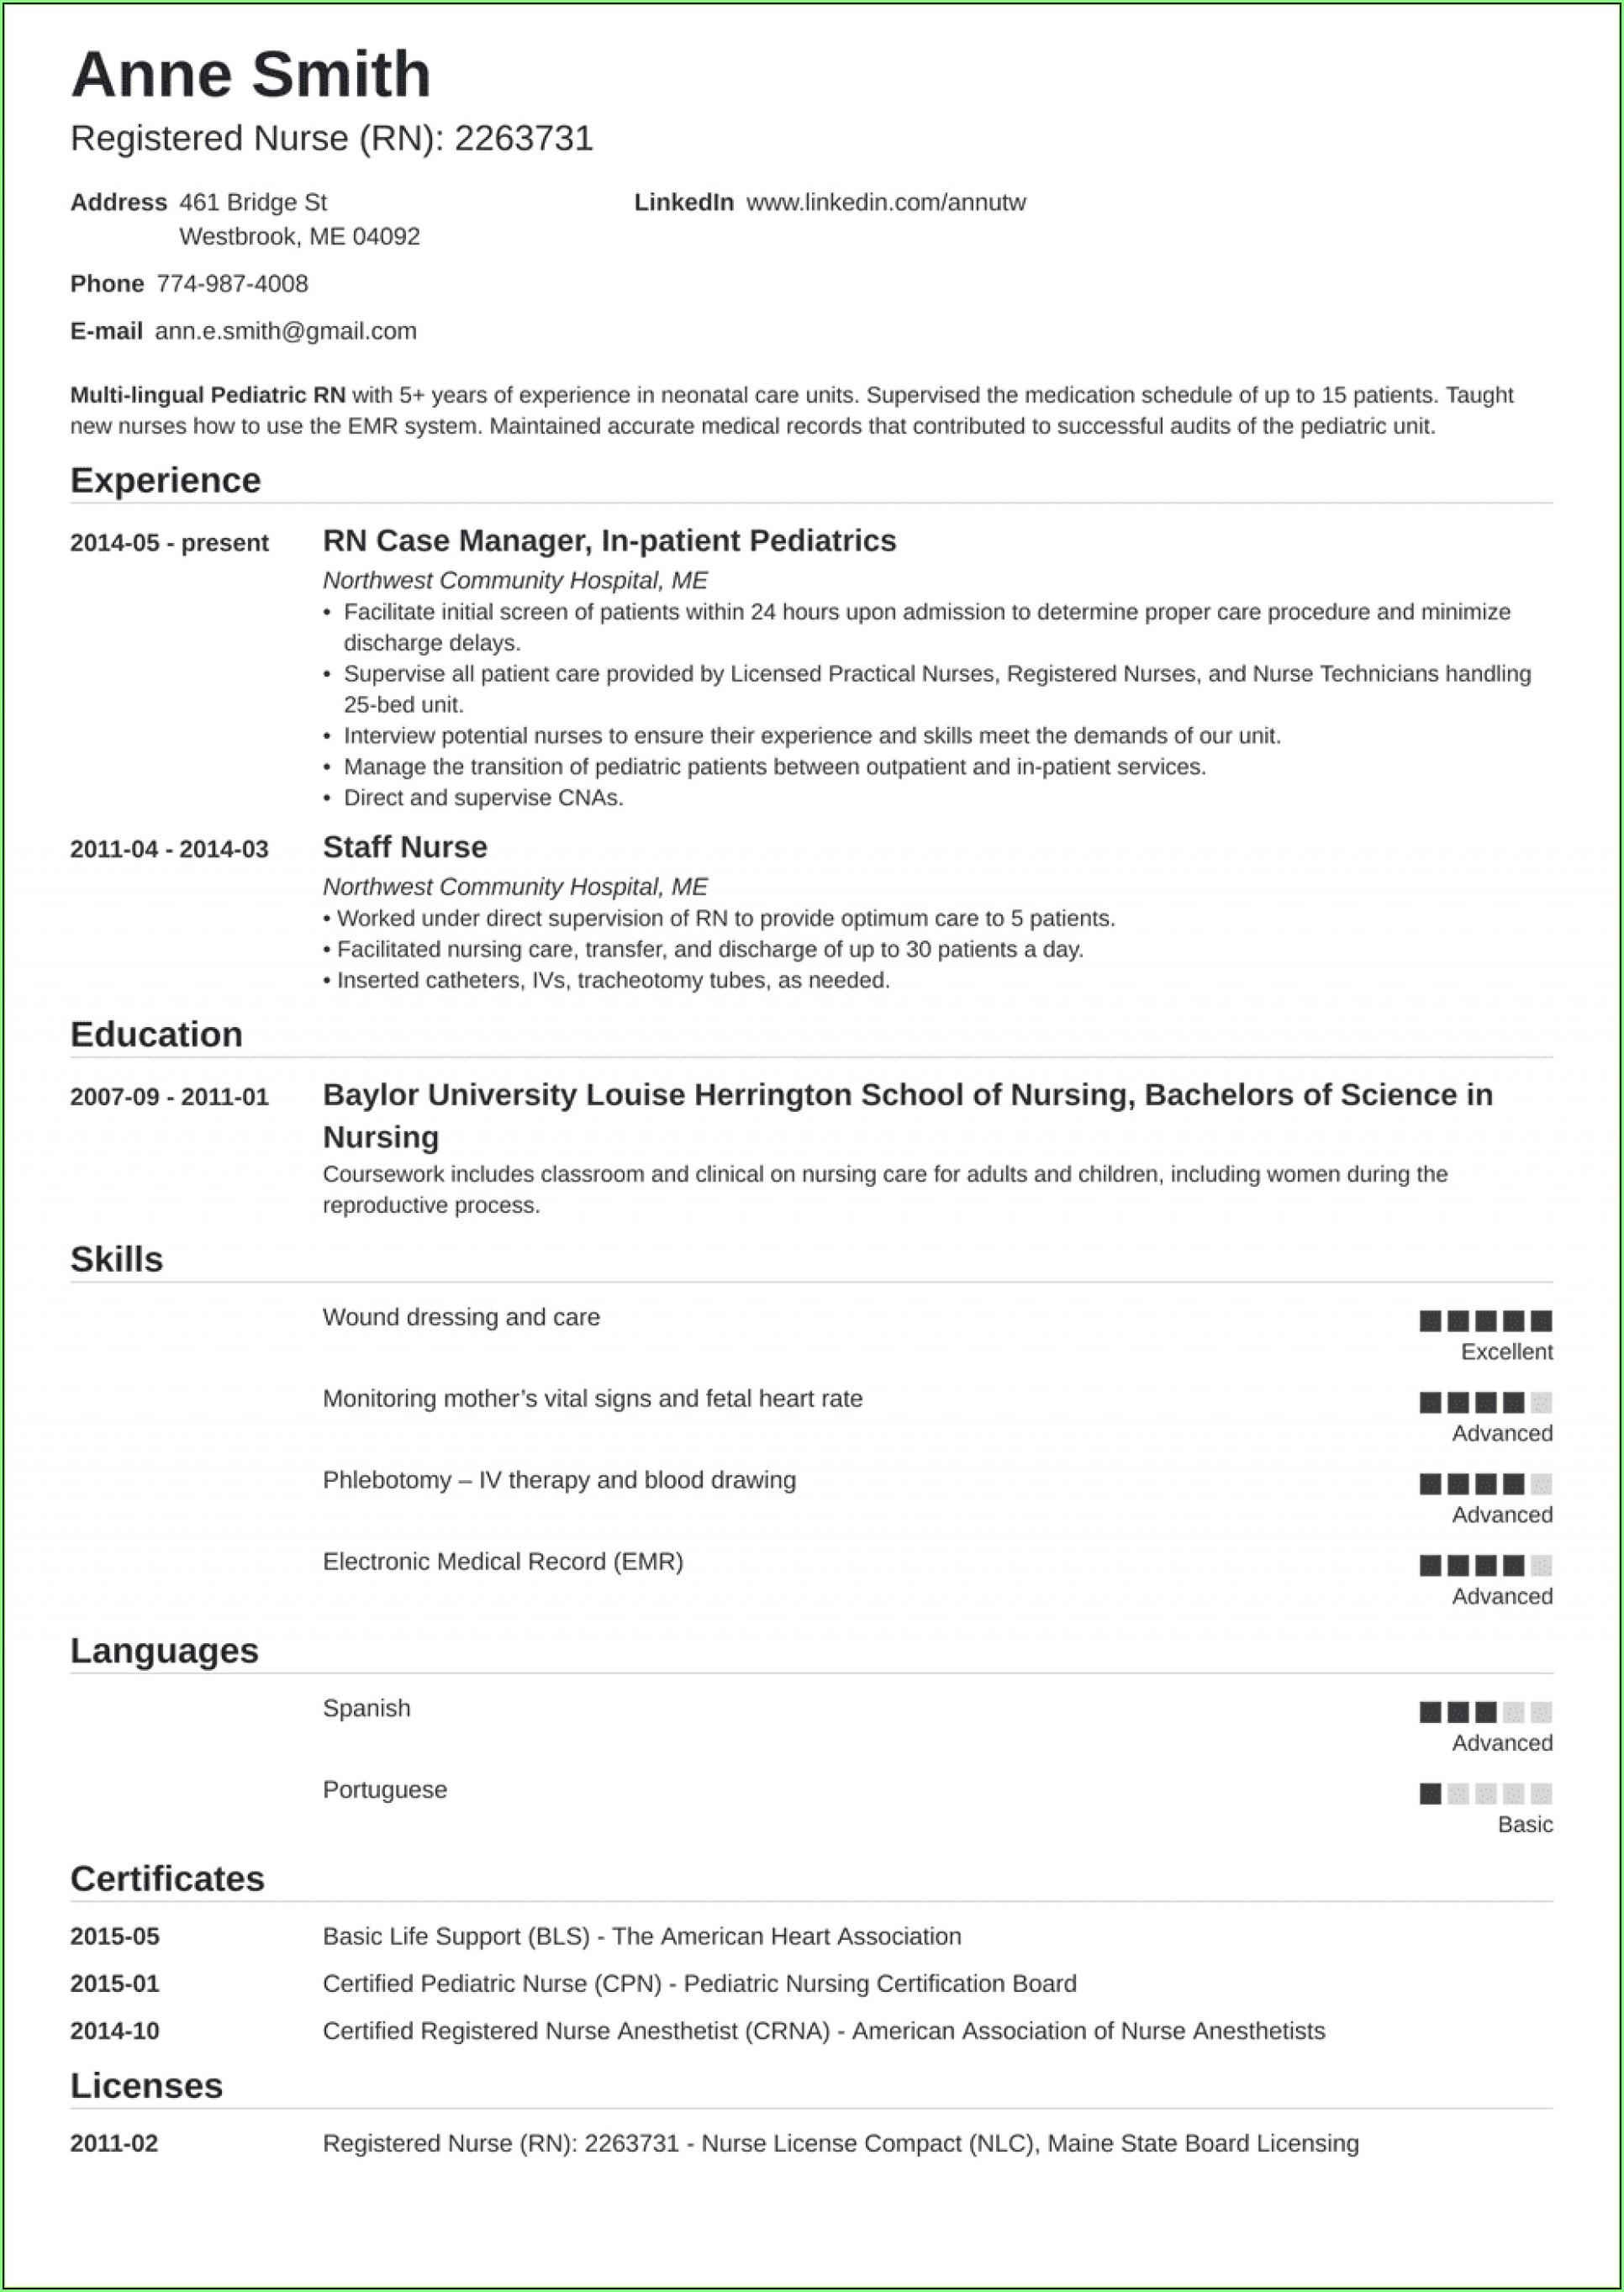 Free Nursing Resume Templates 2019